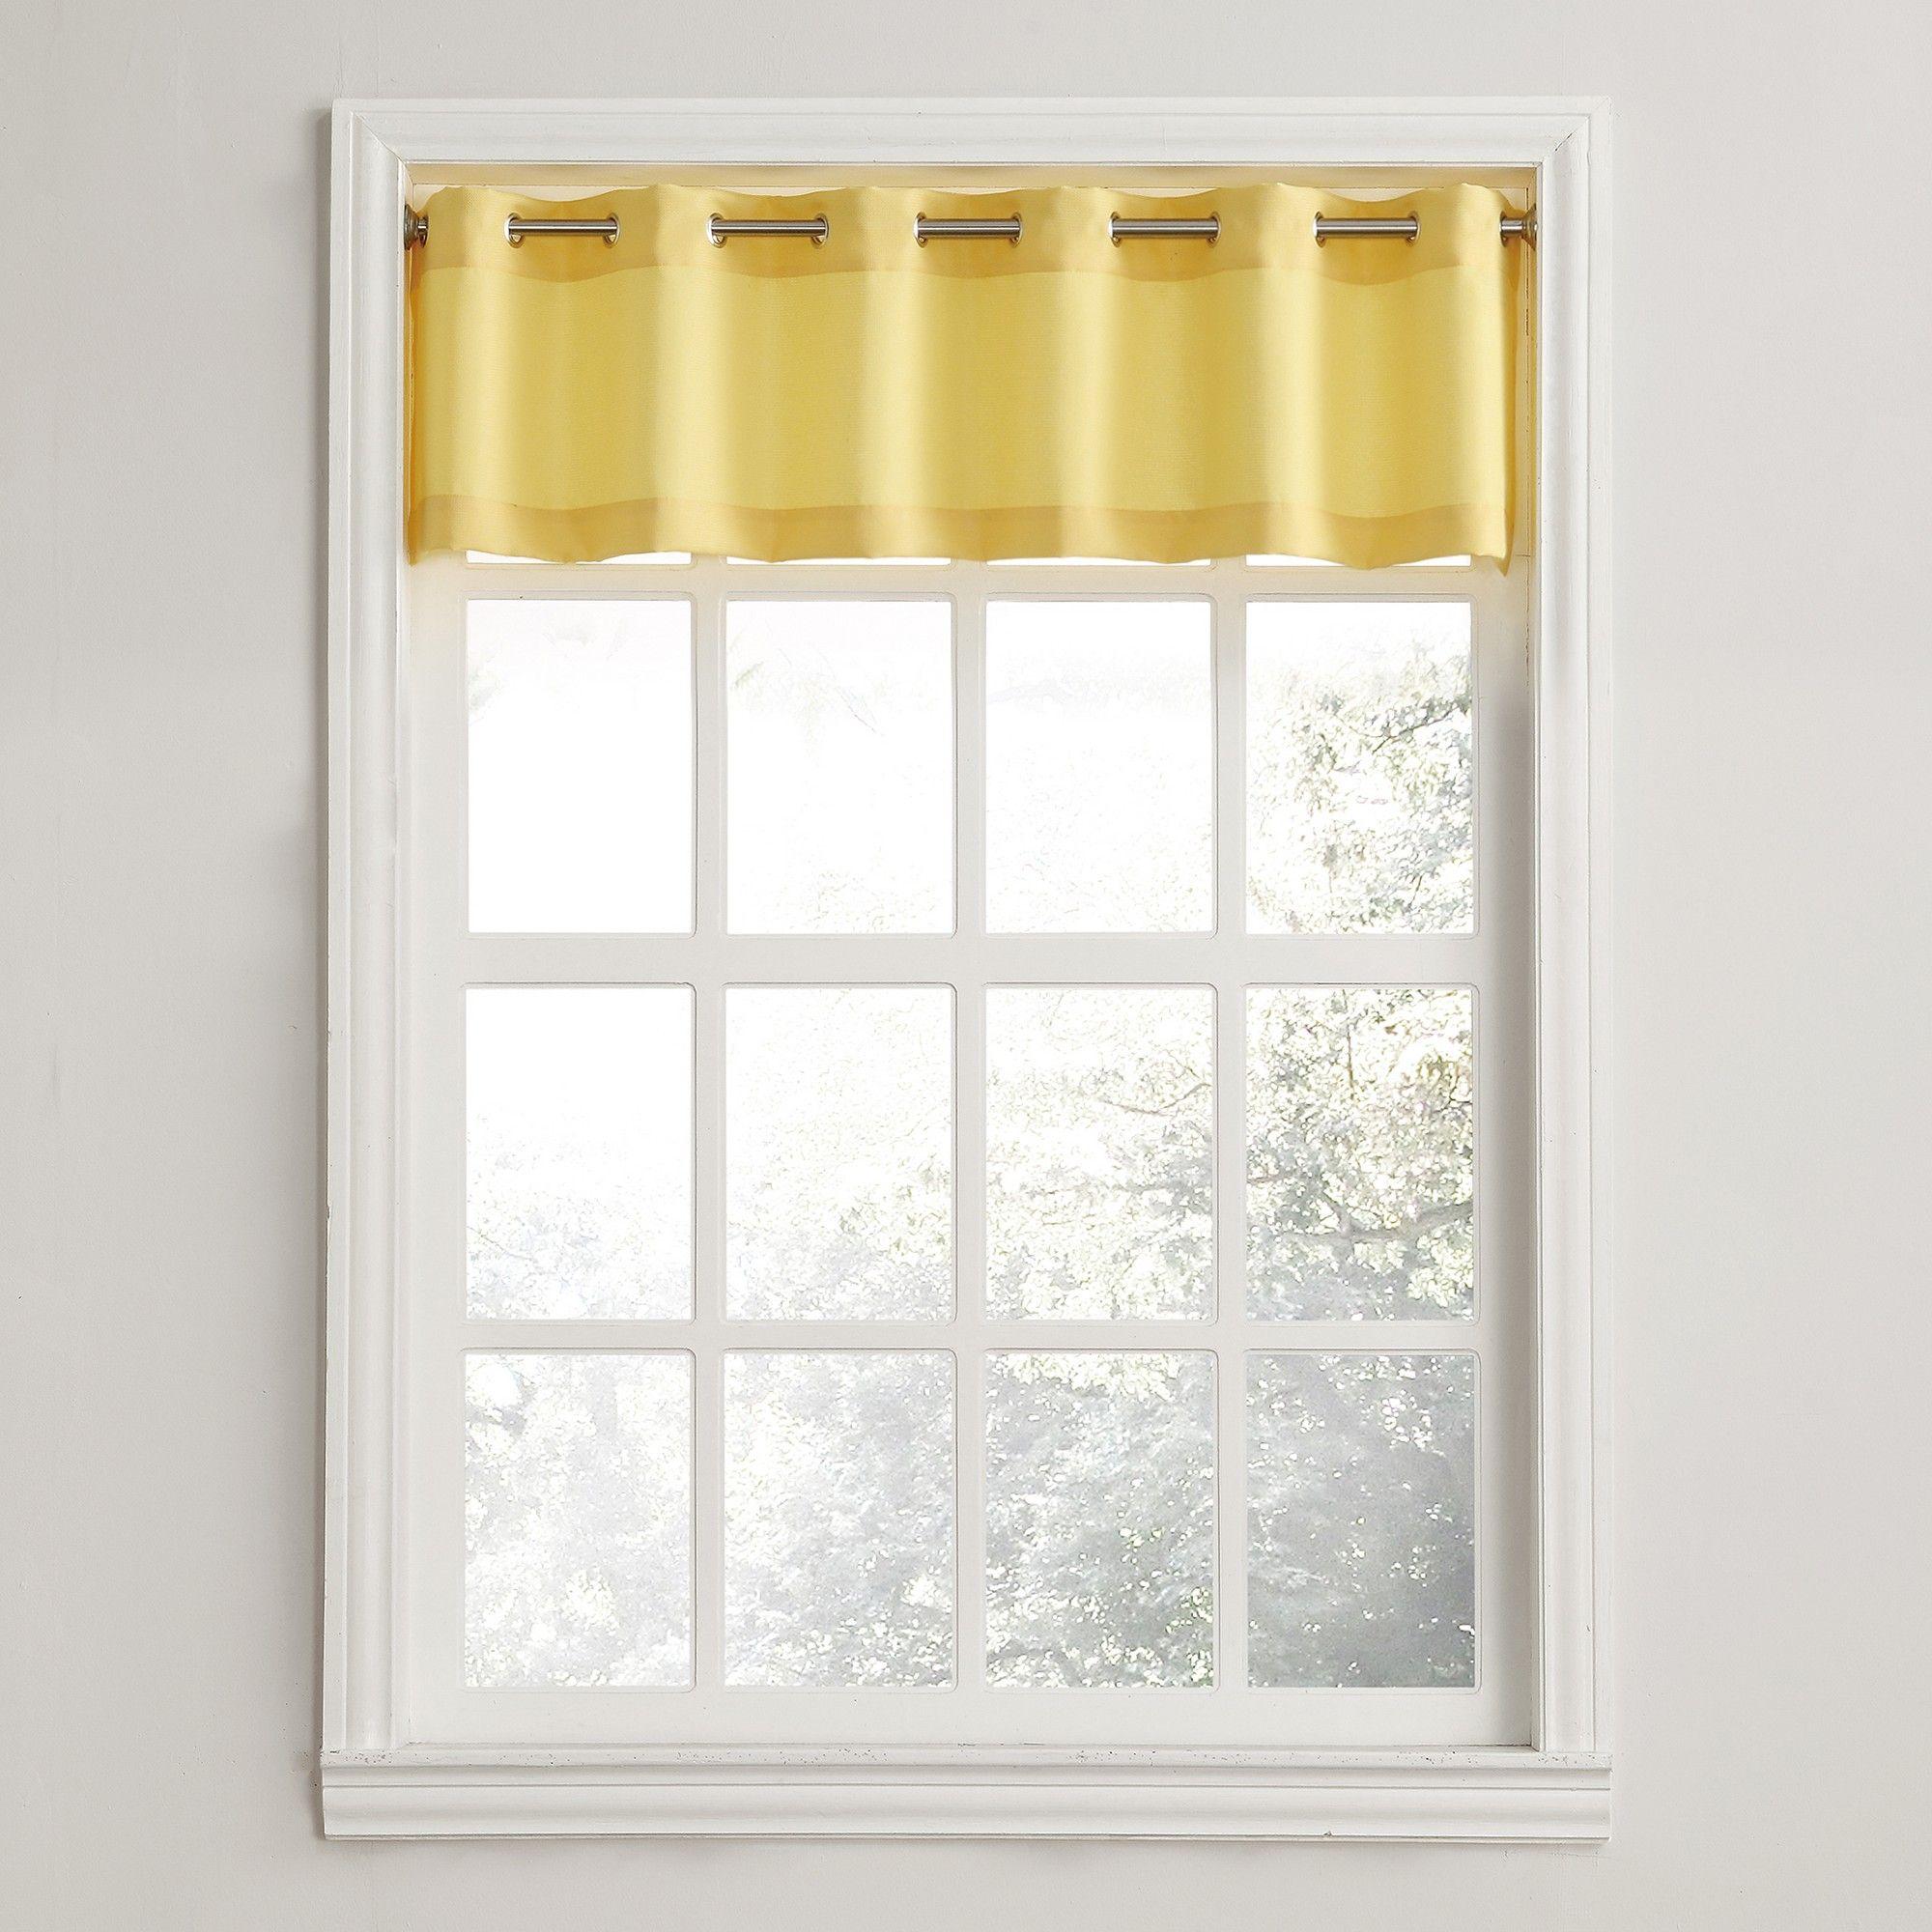 Montego Casual Textured Grommet Kitchen Curtain Valance